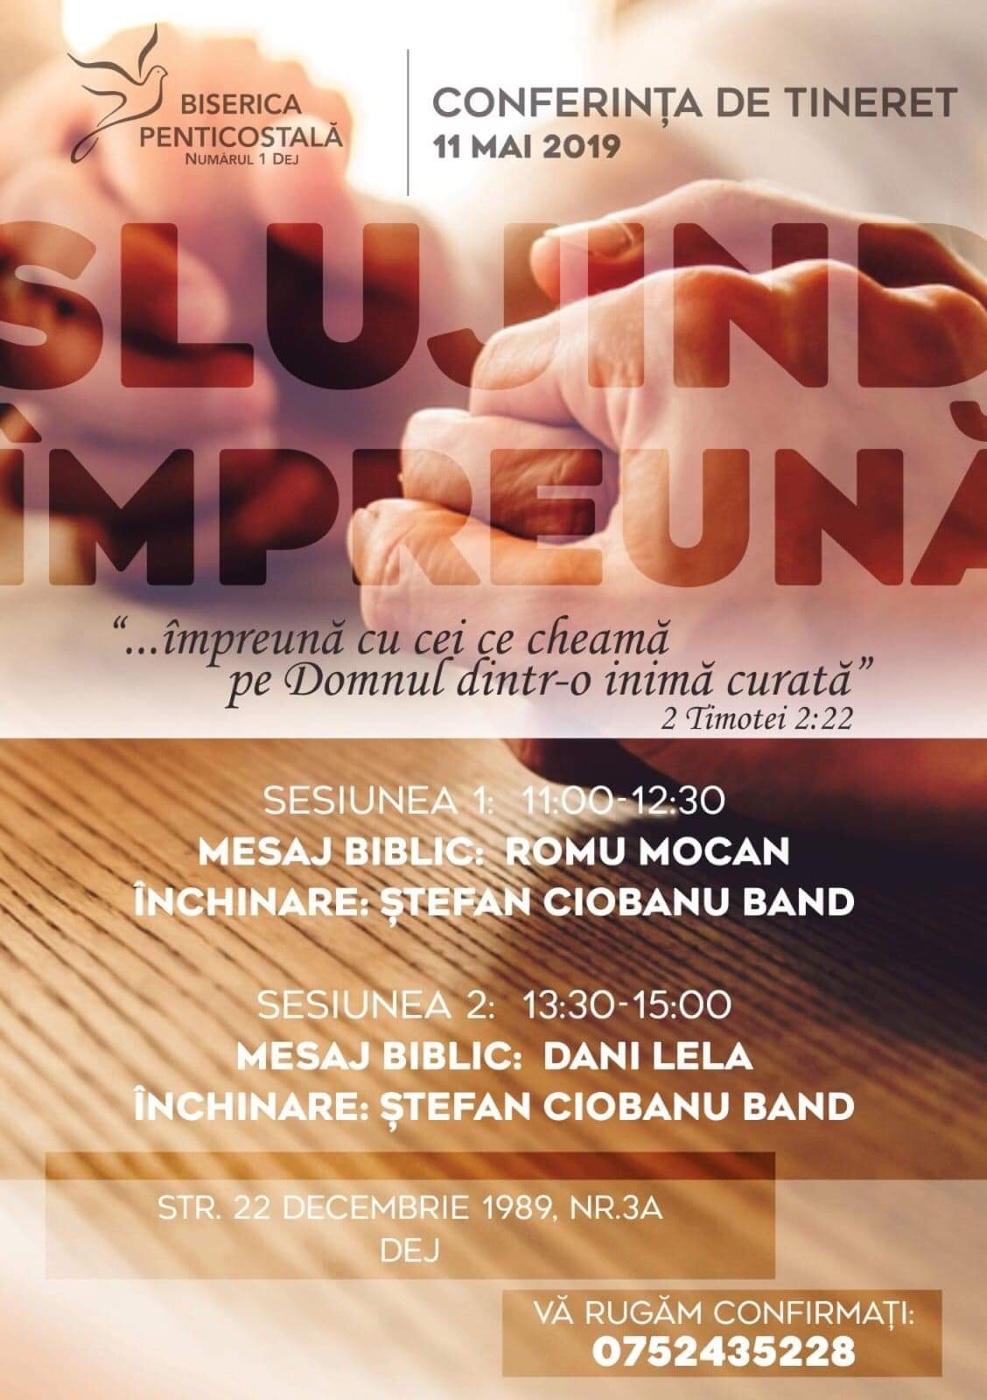 Dej Conferinta De Tineret Invitati Stefan Ciobanu Band Dani Lela